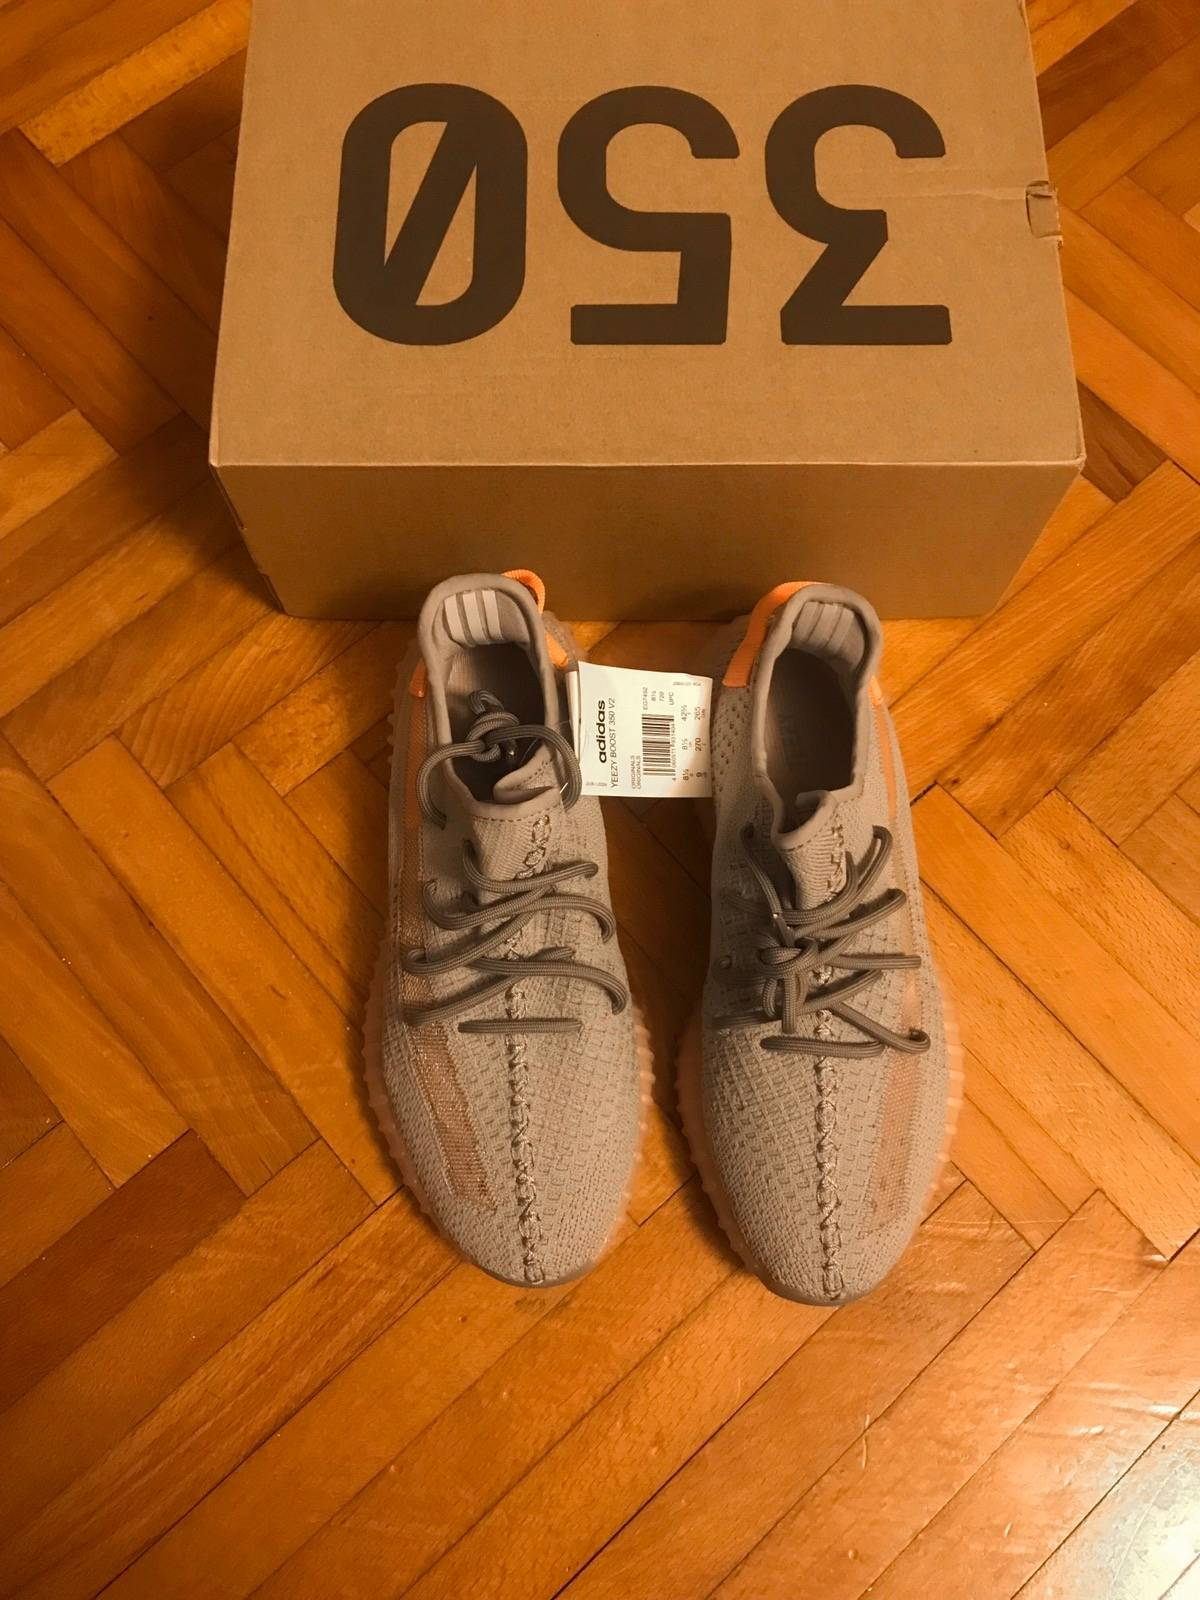 9214bd0bc55e3 Adidas Kanye West Adidas Yeezy Boost 350 V2 Trfrm